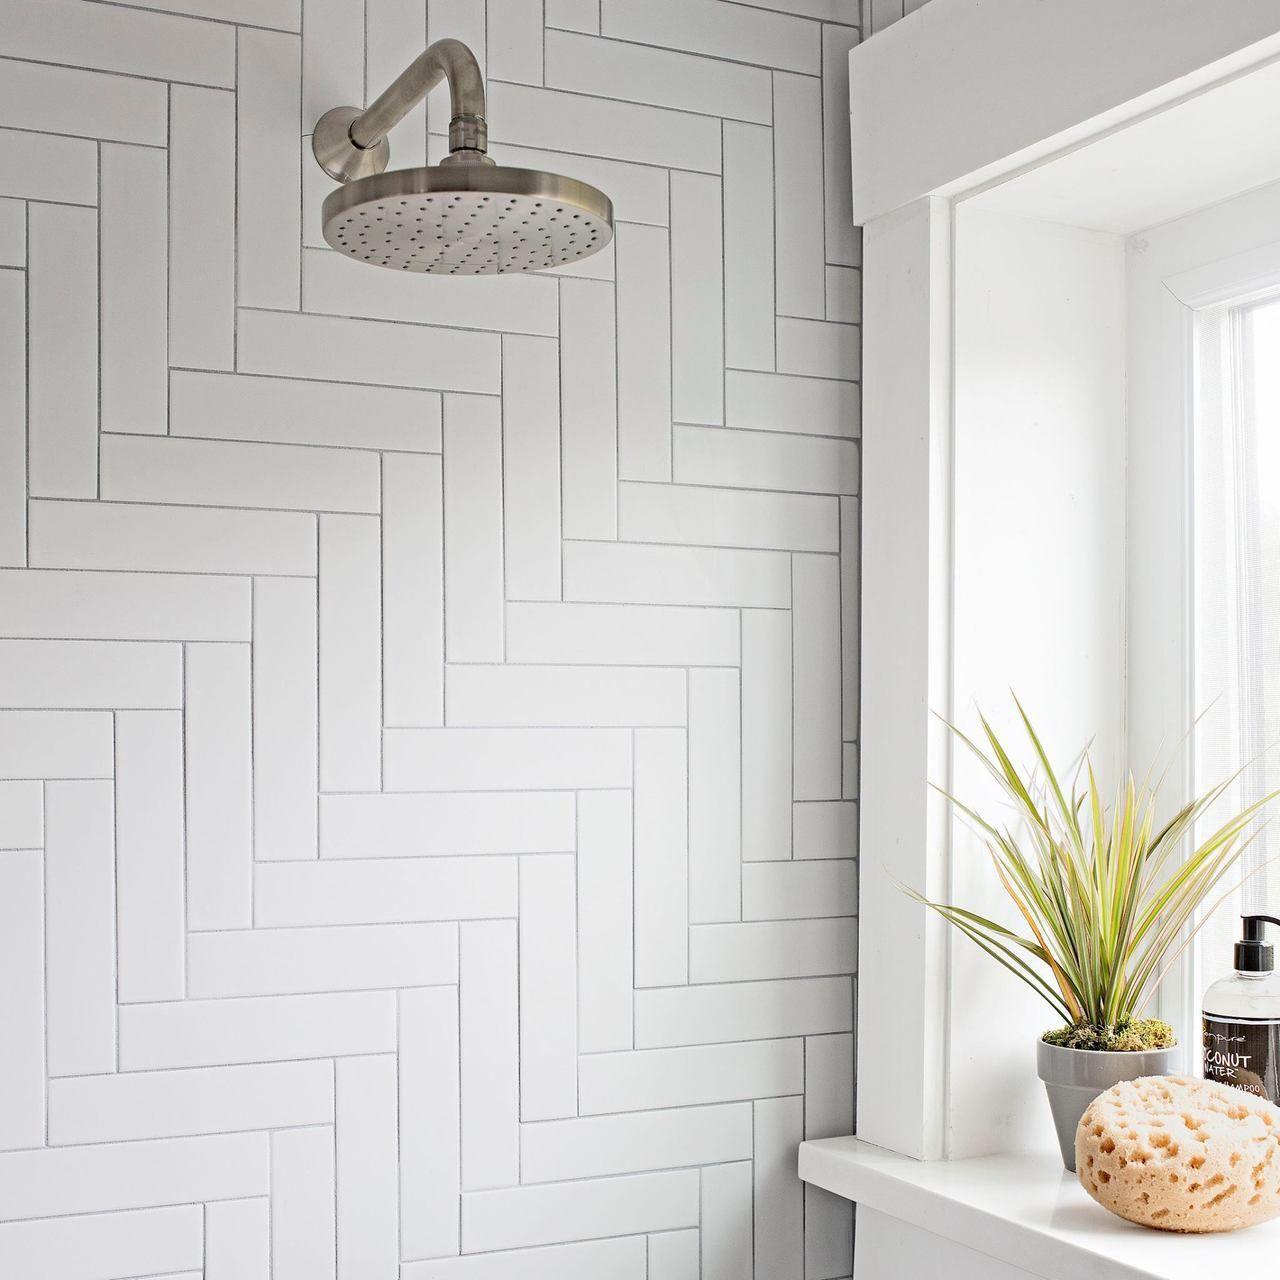 Explore Bath Tiles, Ceramic Wall Tiles, And More!